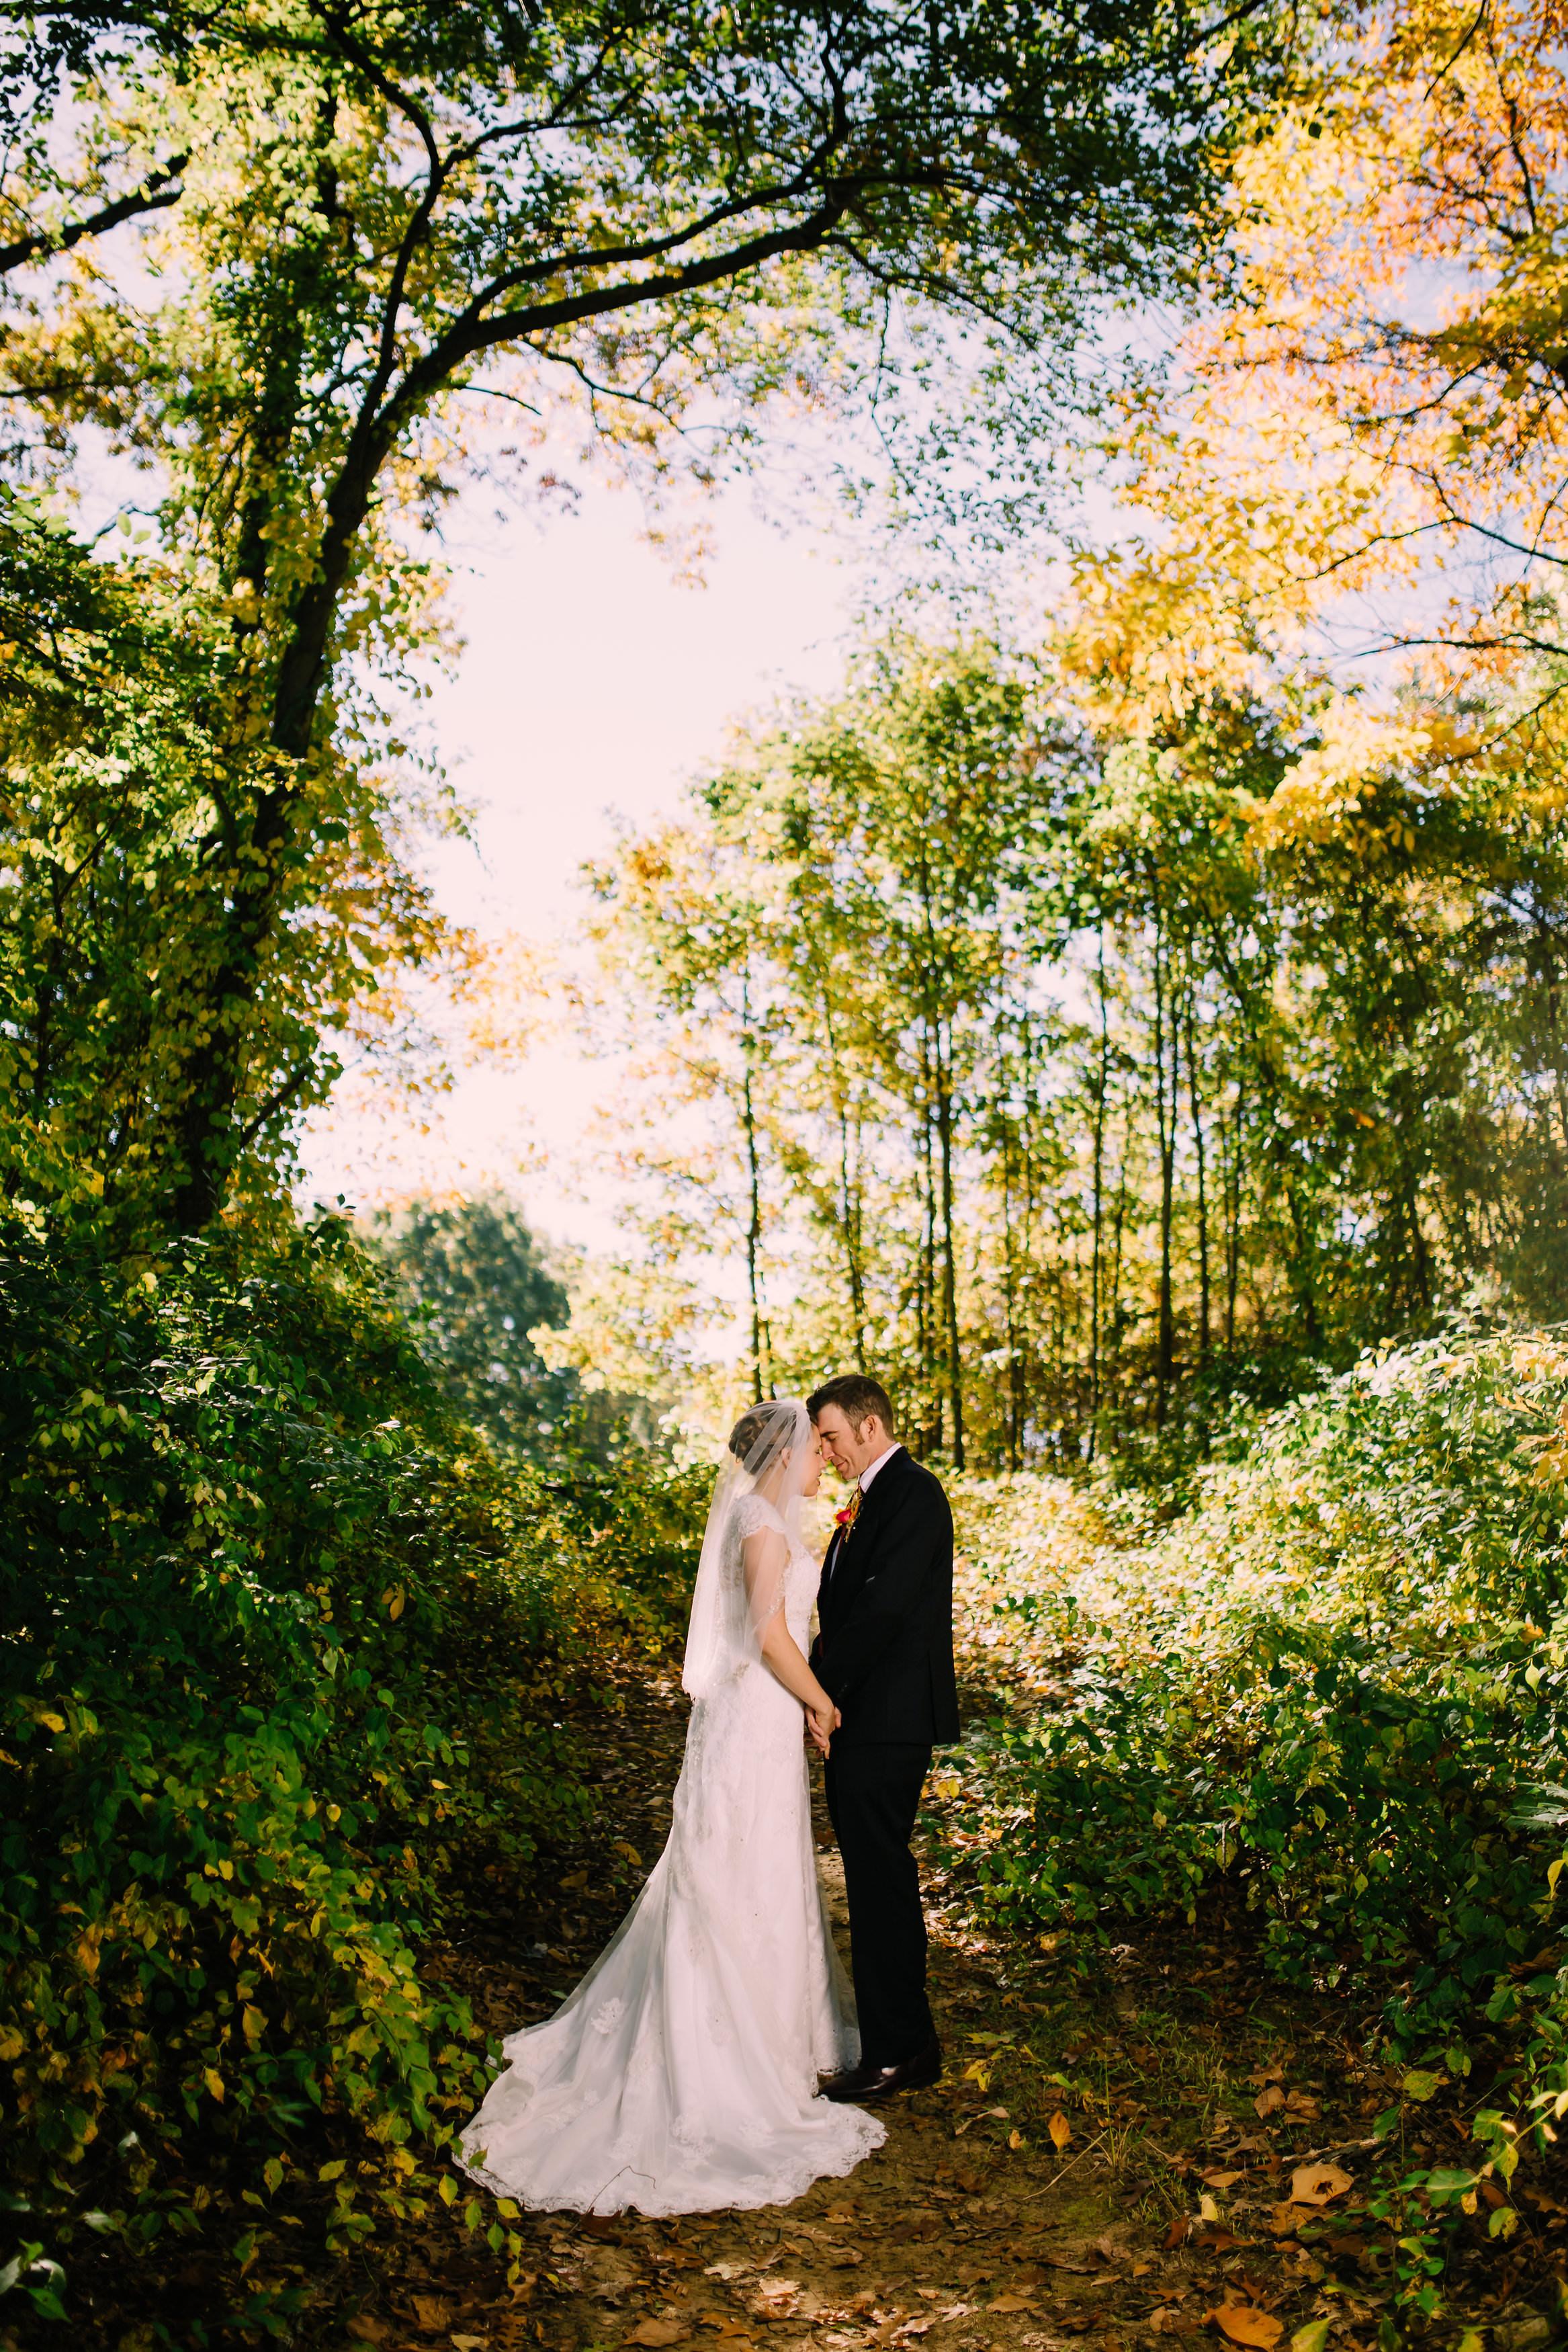 Beautiful bride and groom portraits at Wildwood Metropark